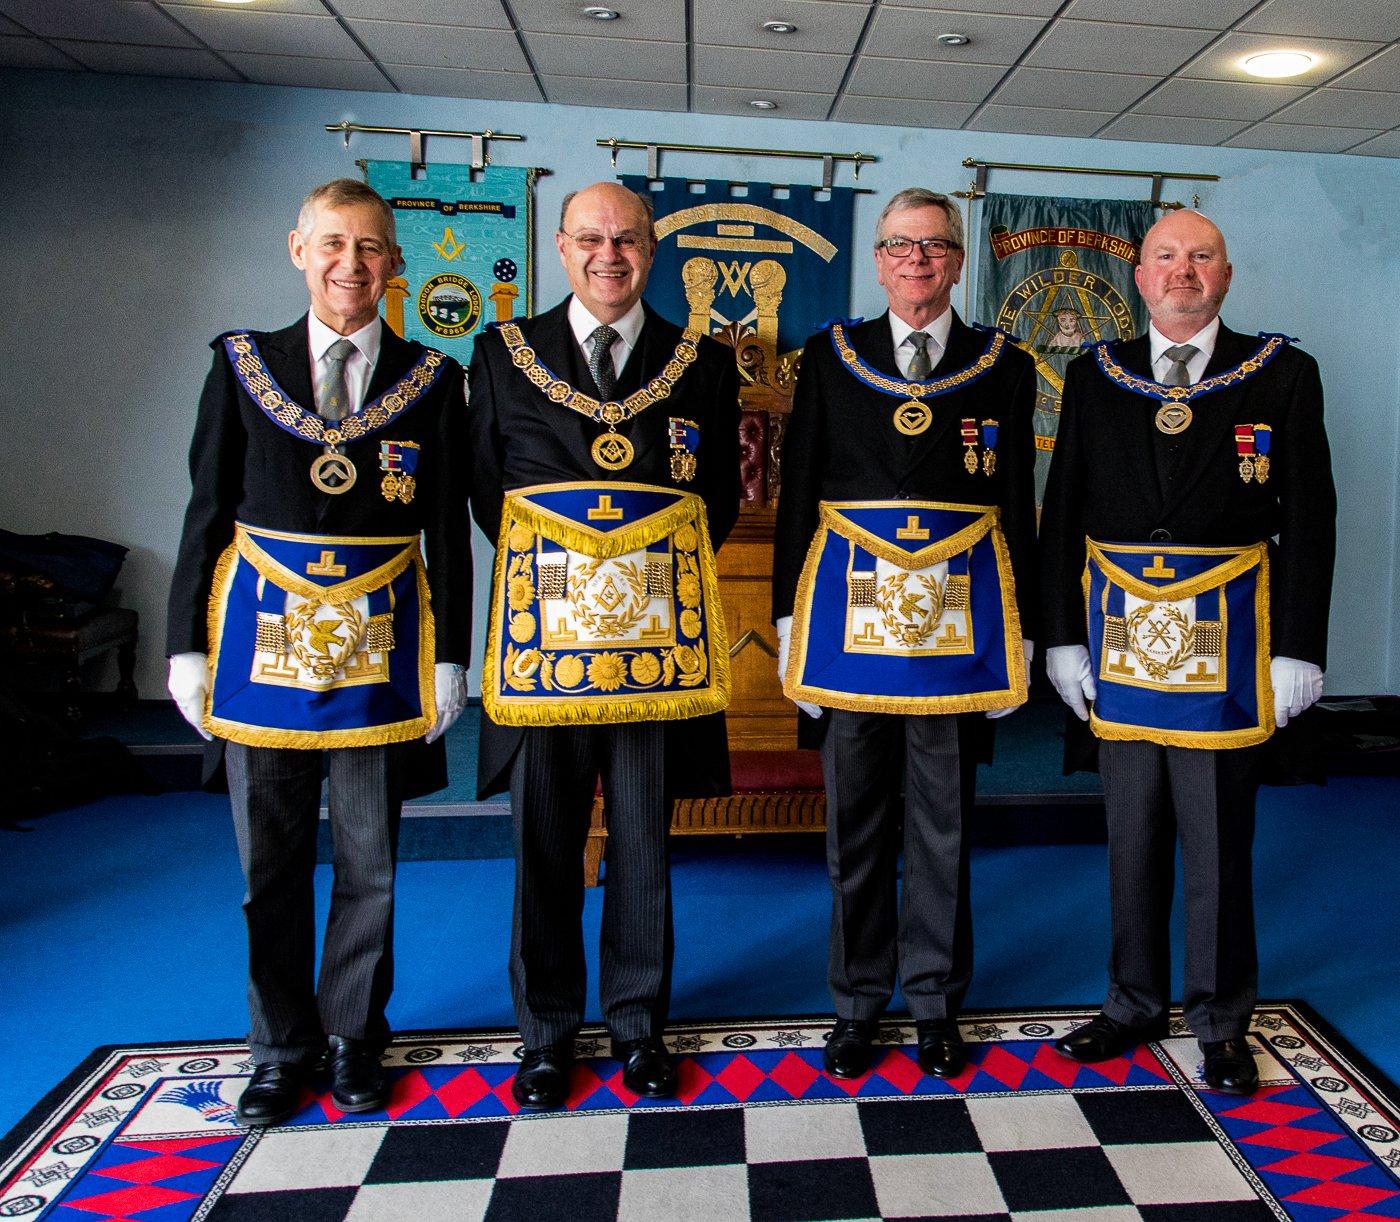 The Executive - Berkshire Freemasons